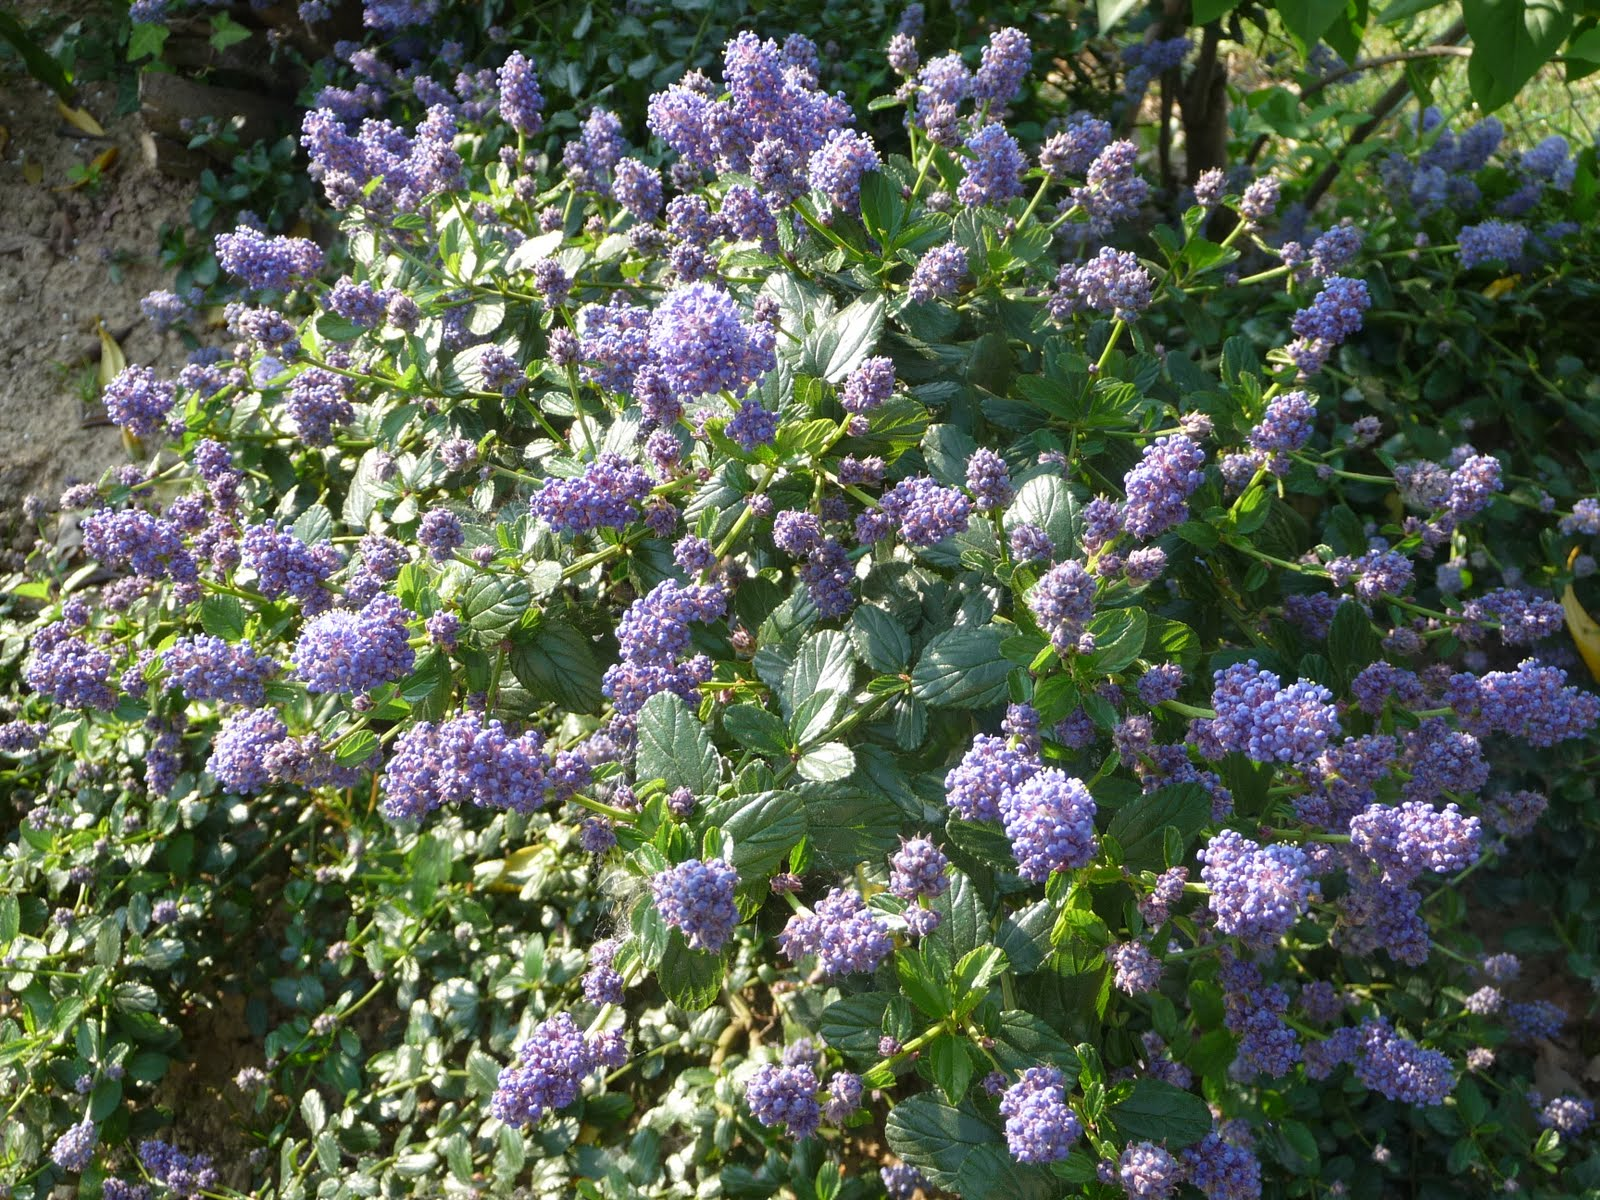 Ma terre de bruy re plantations de la haie plein sud - Planter hortensia plein soleil ...